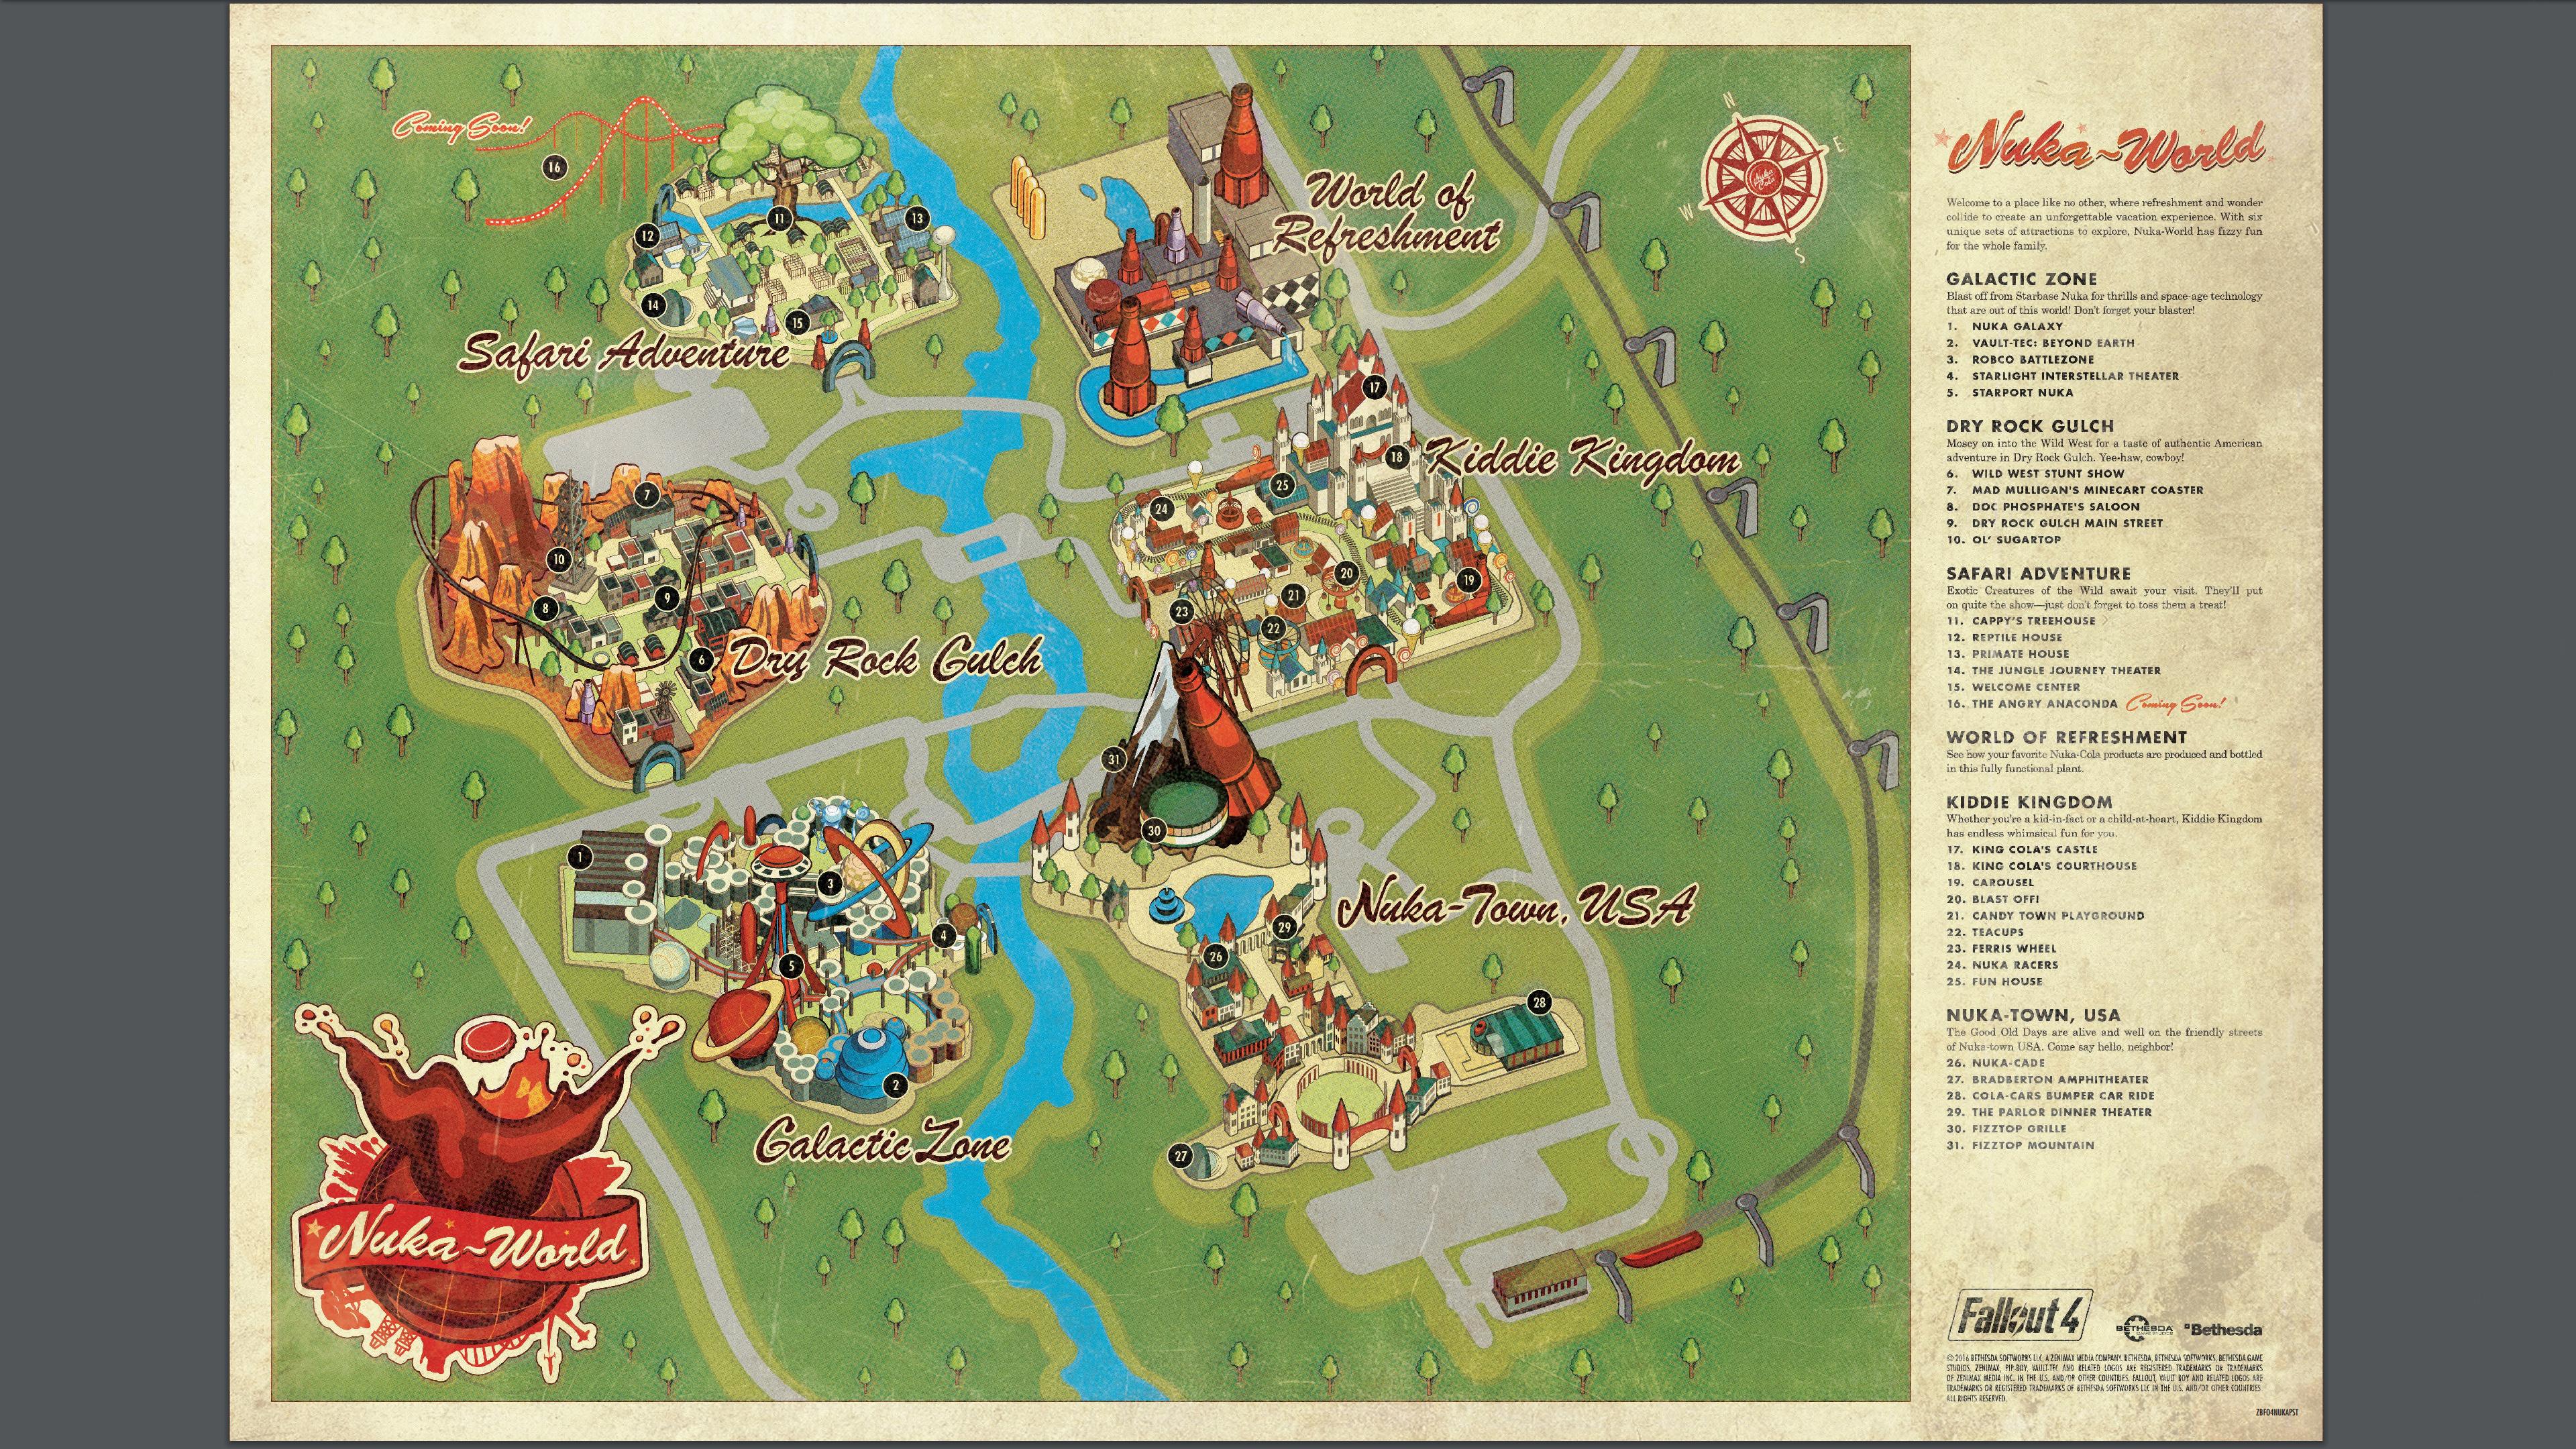 Fallout 4 Nuka World Park Map